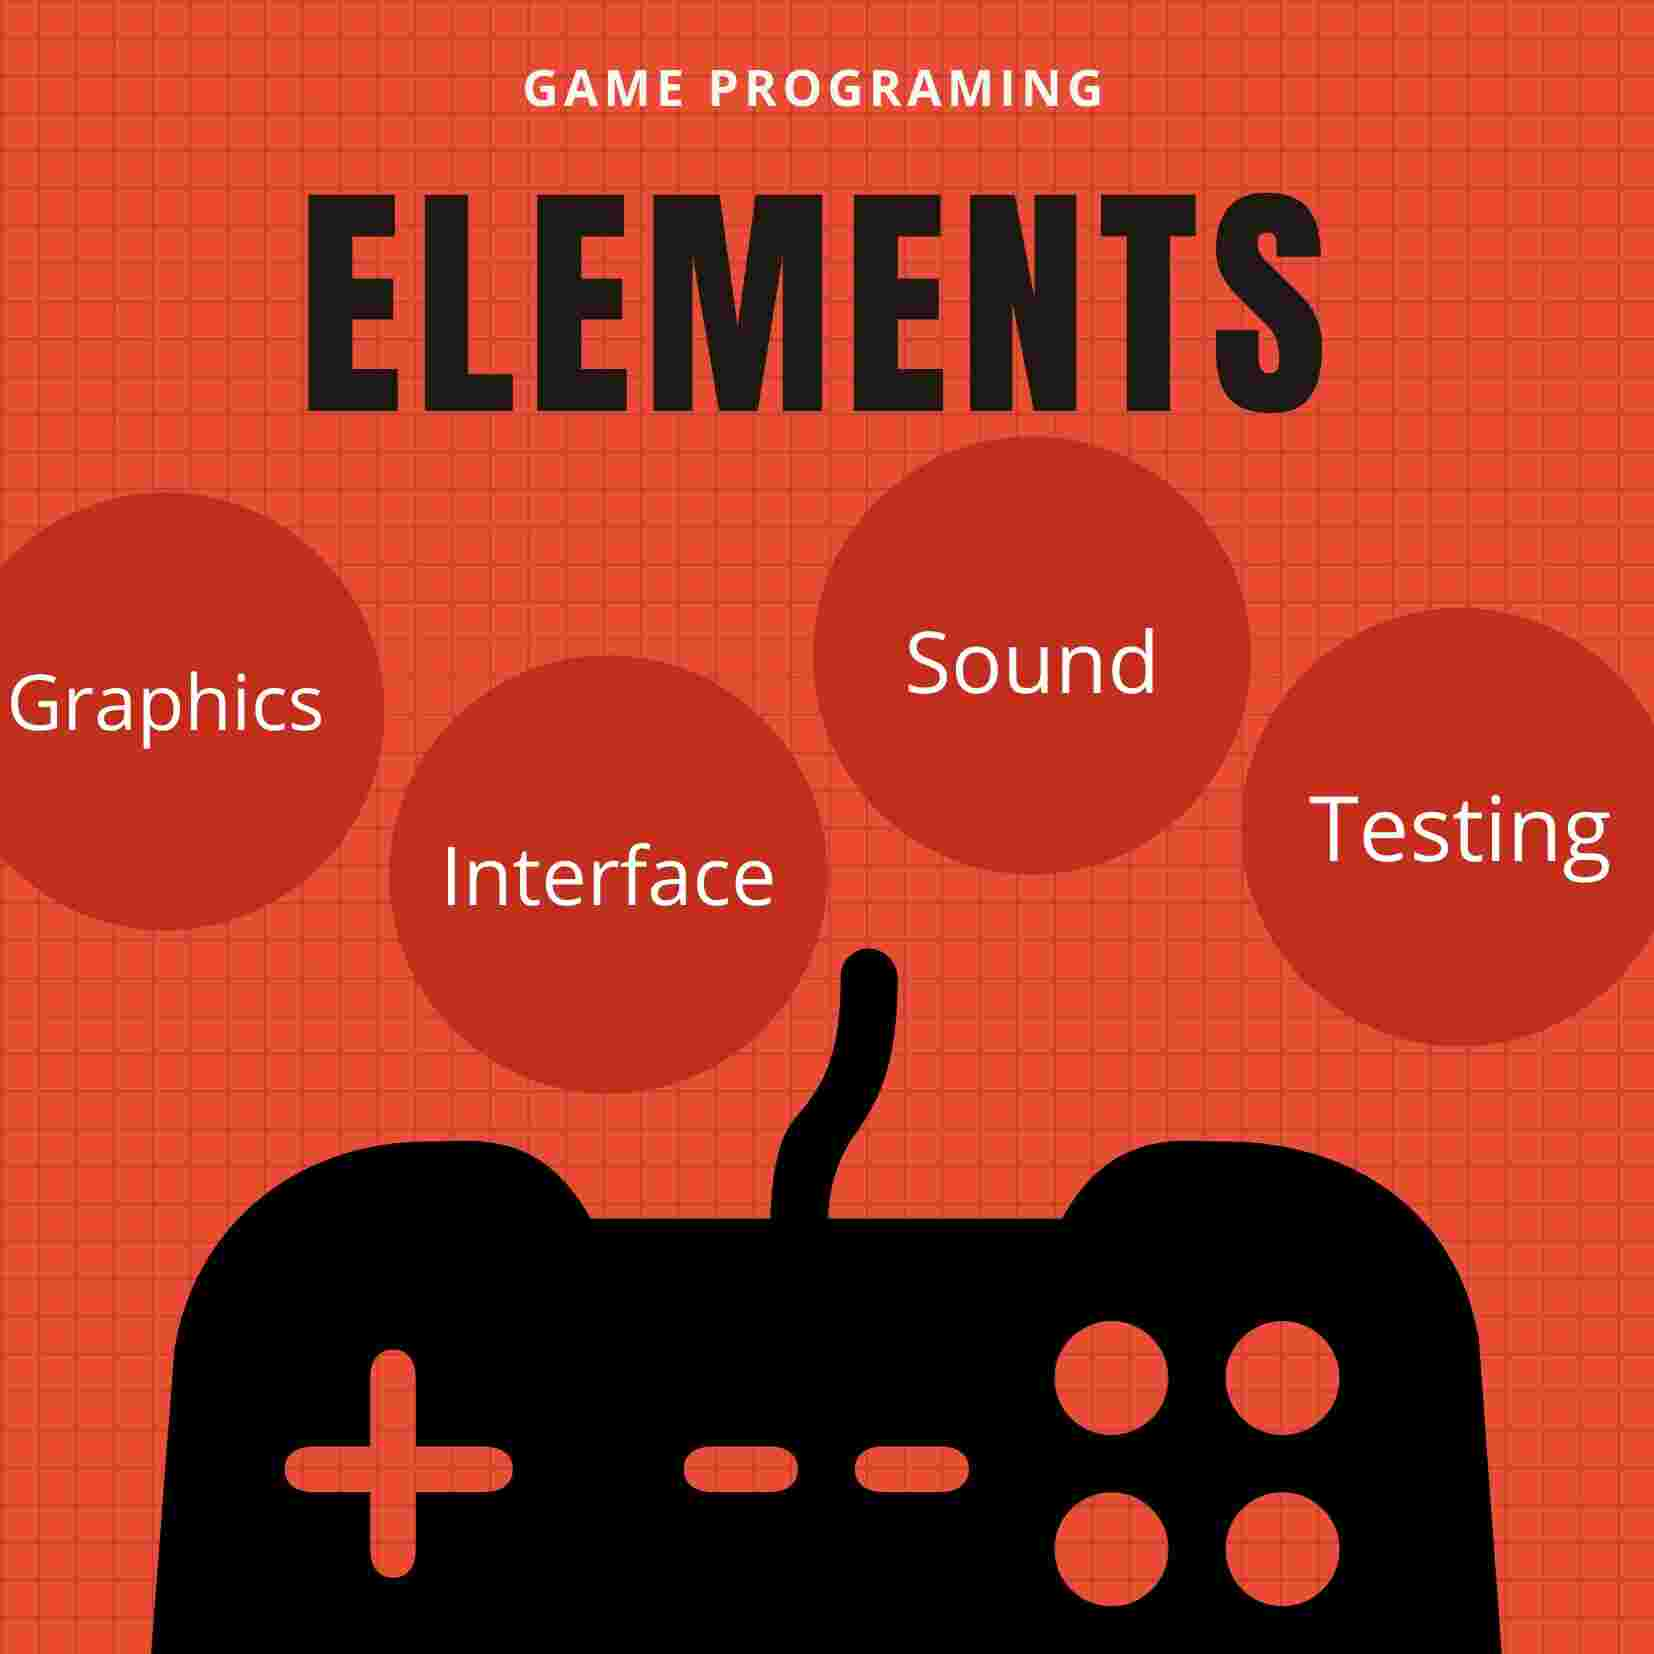 Elements Game Programing (1)